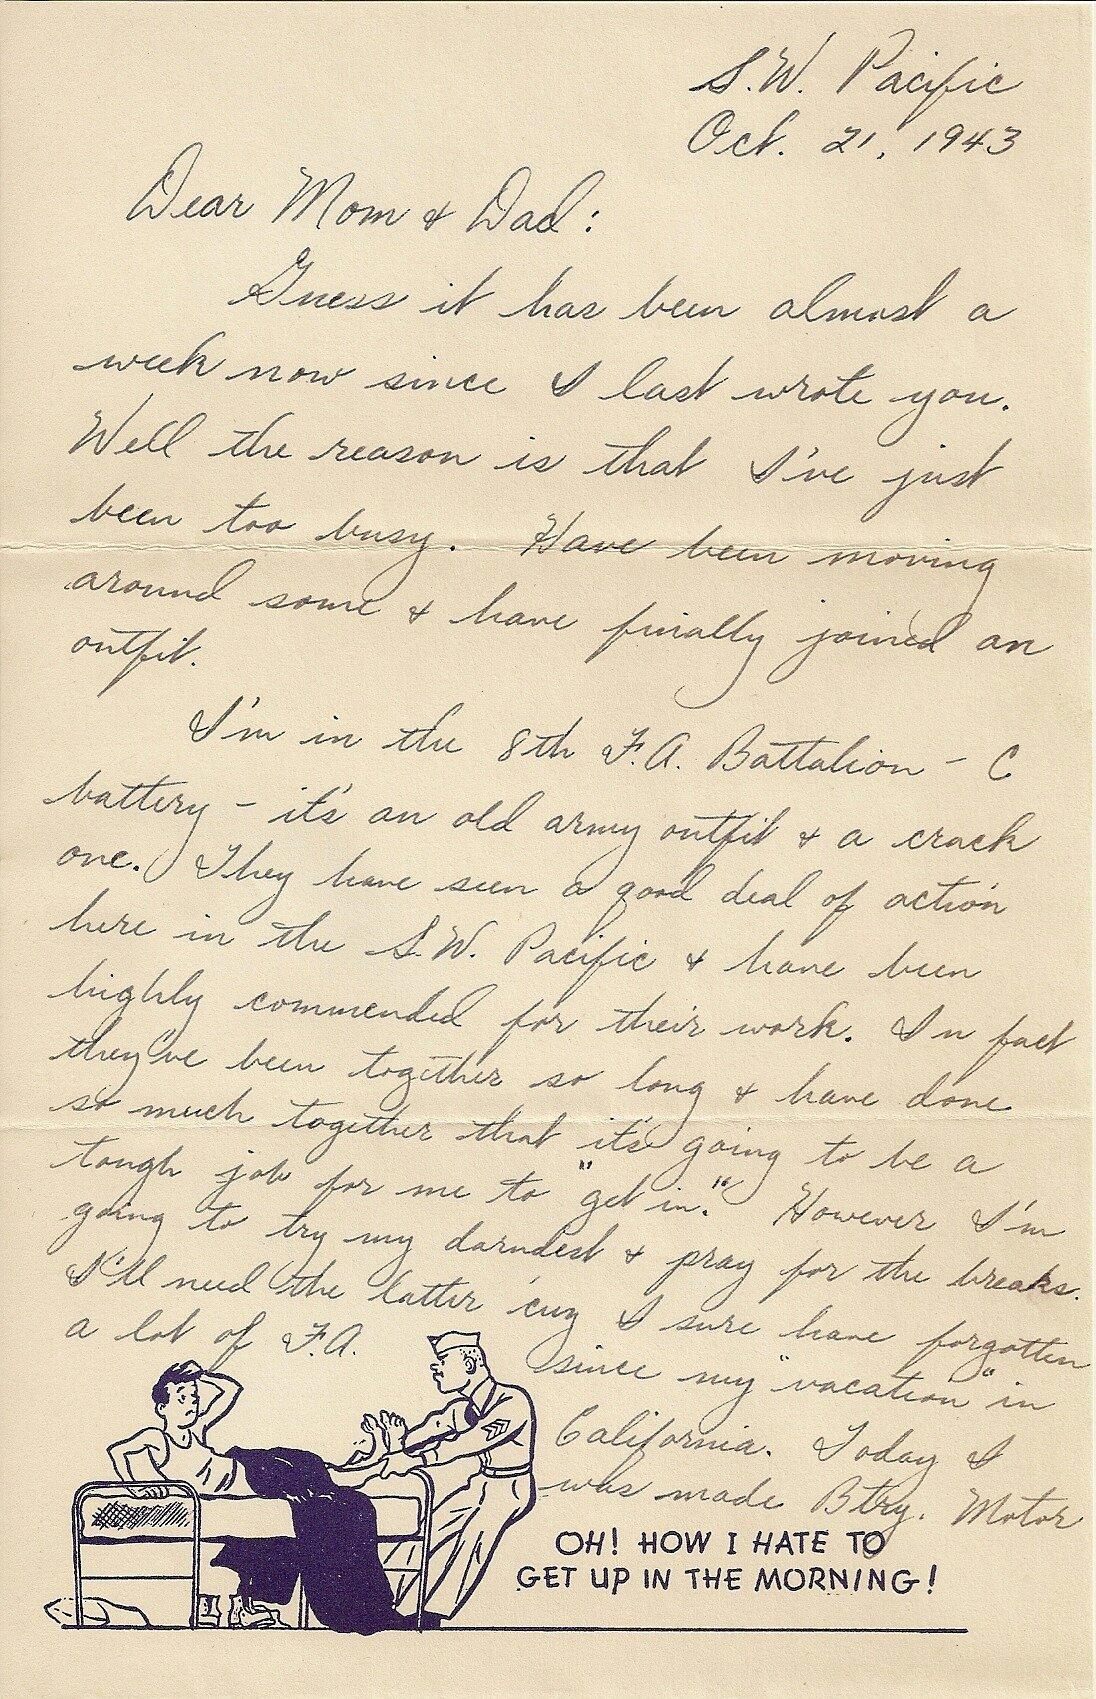 10.21.1943c.jpg